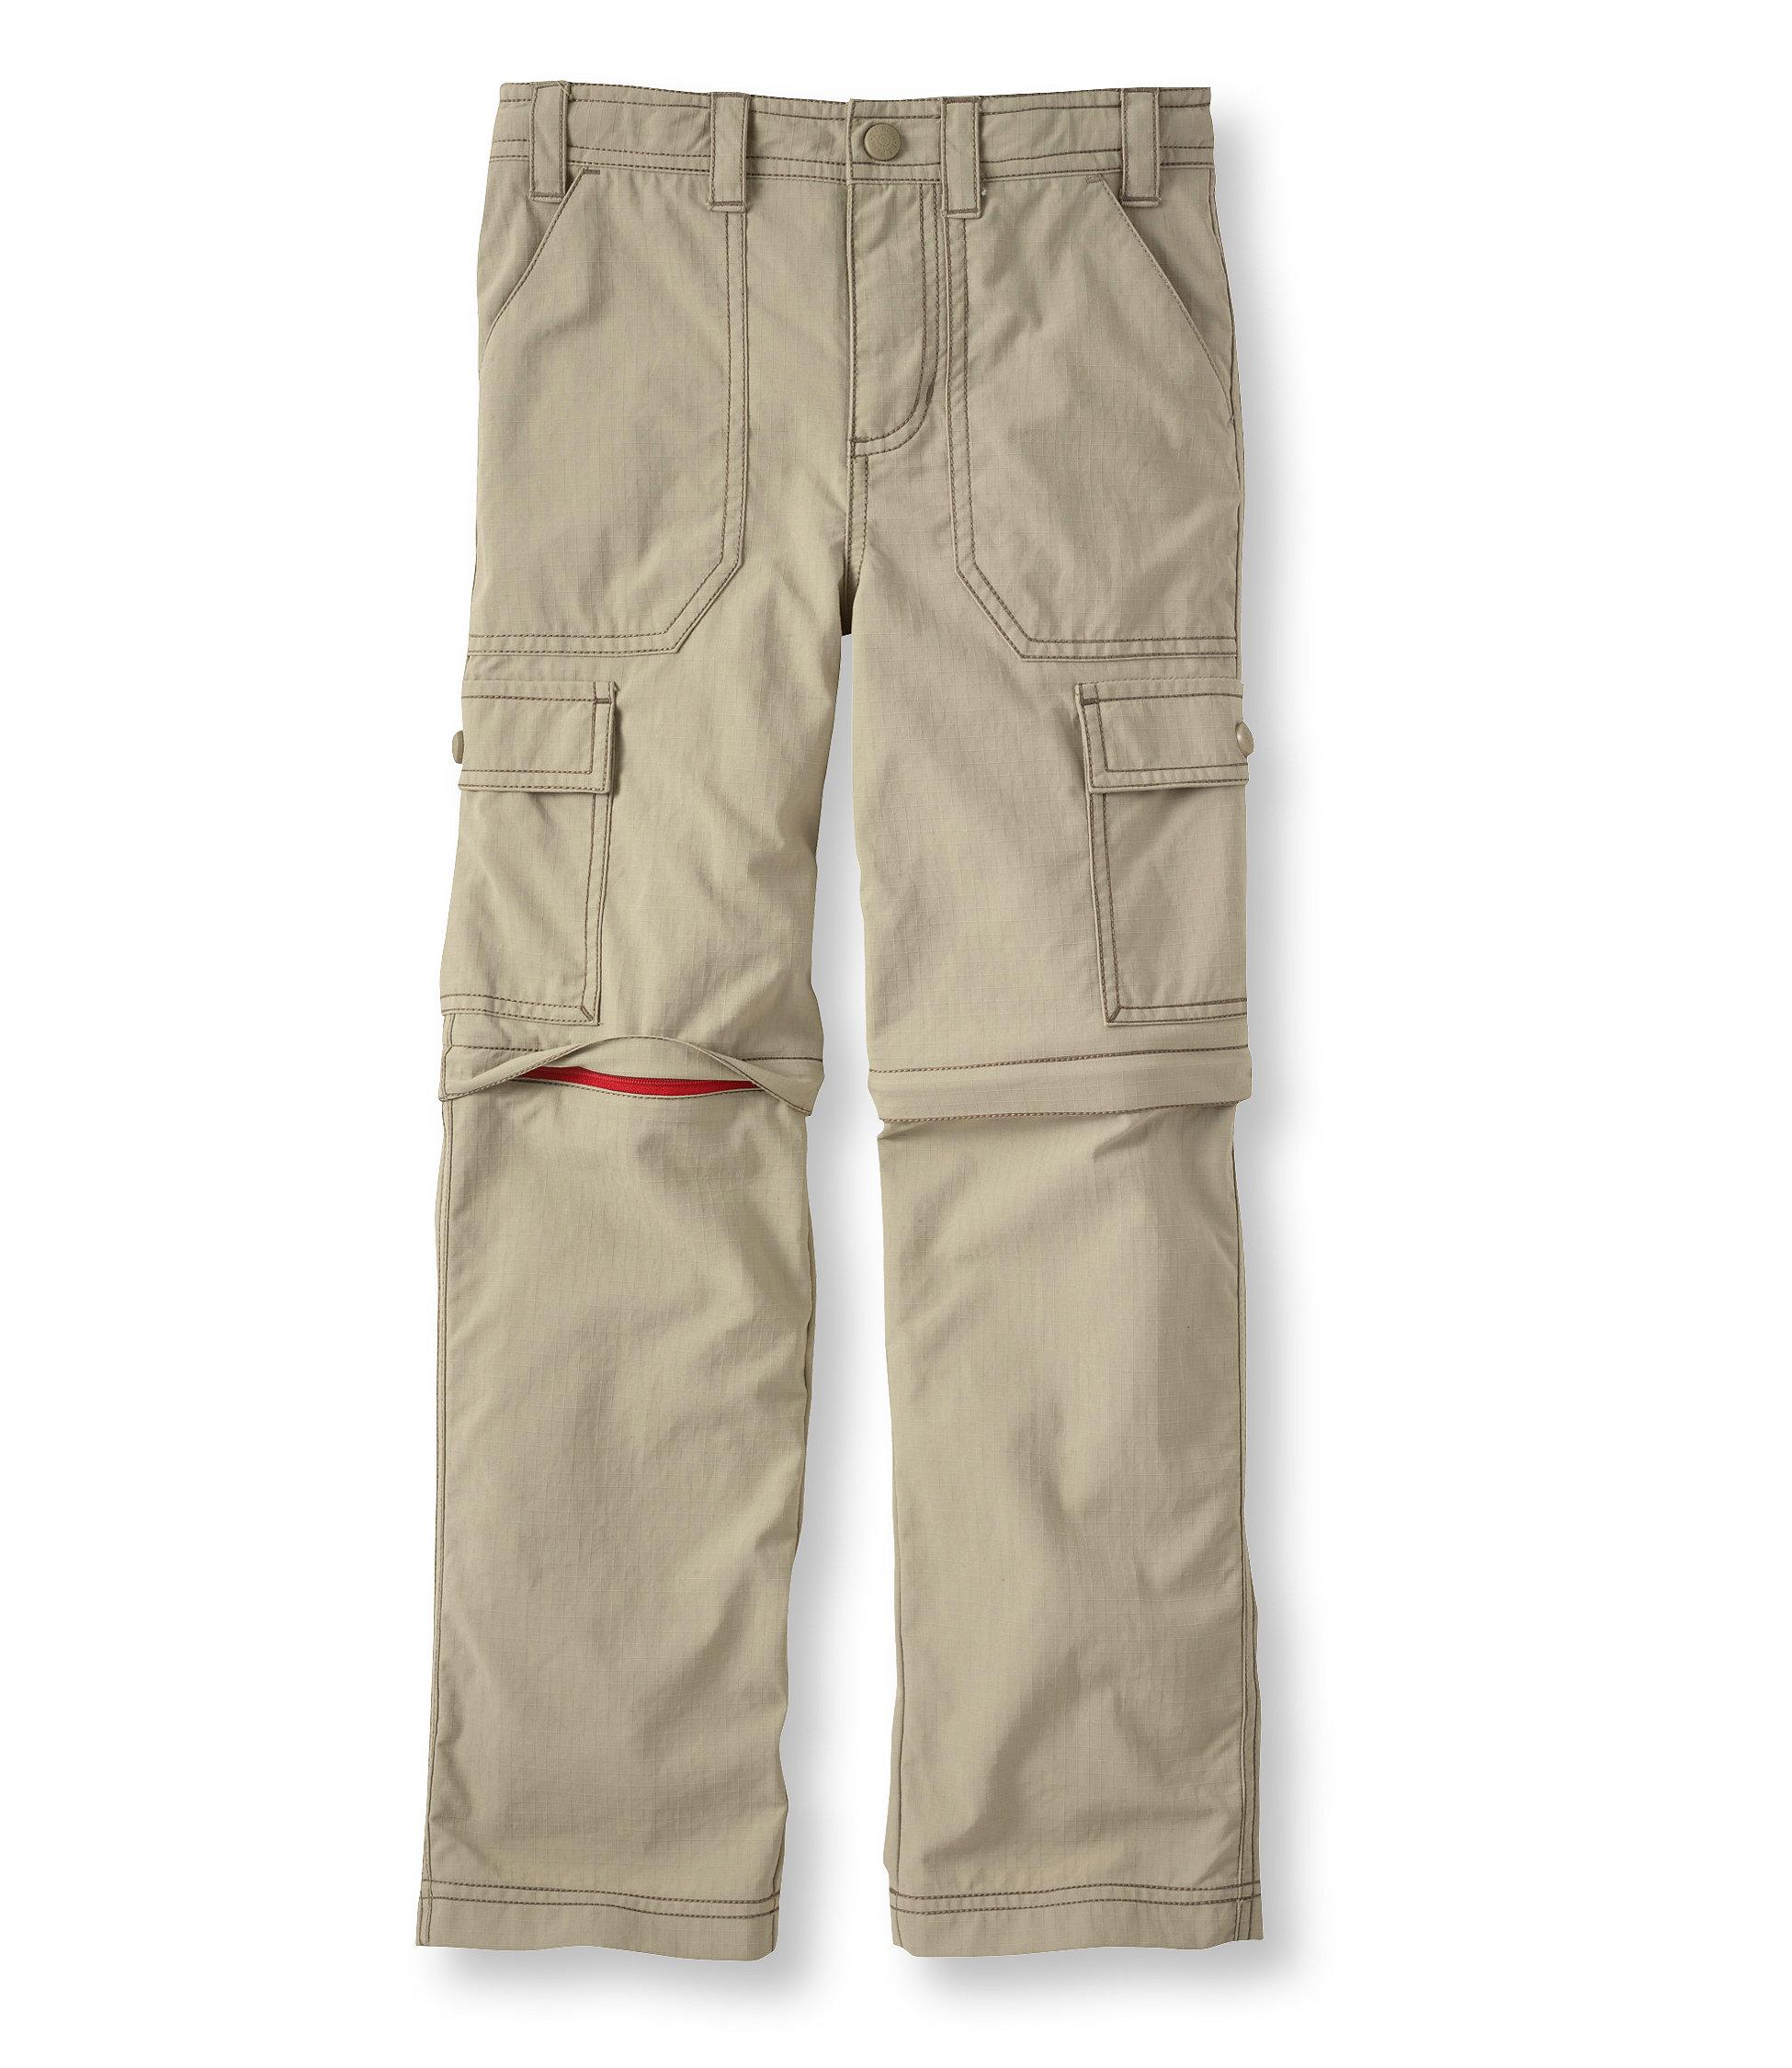 L.L.Bean Trekking Pants